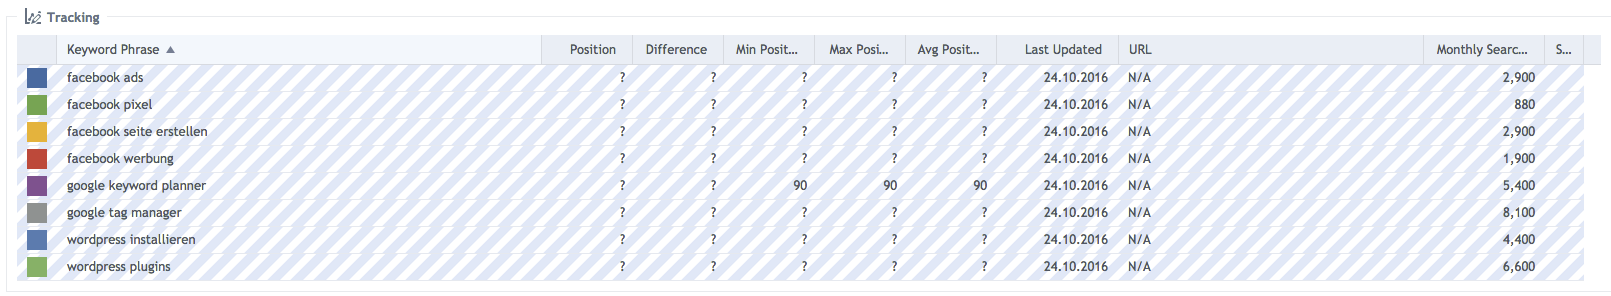 SEO Optmierung: Rank Tracking im Monat 1